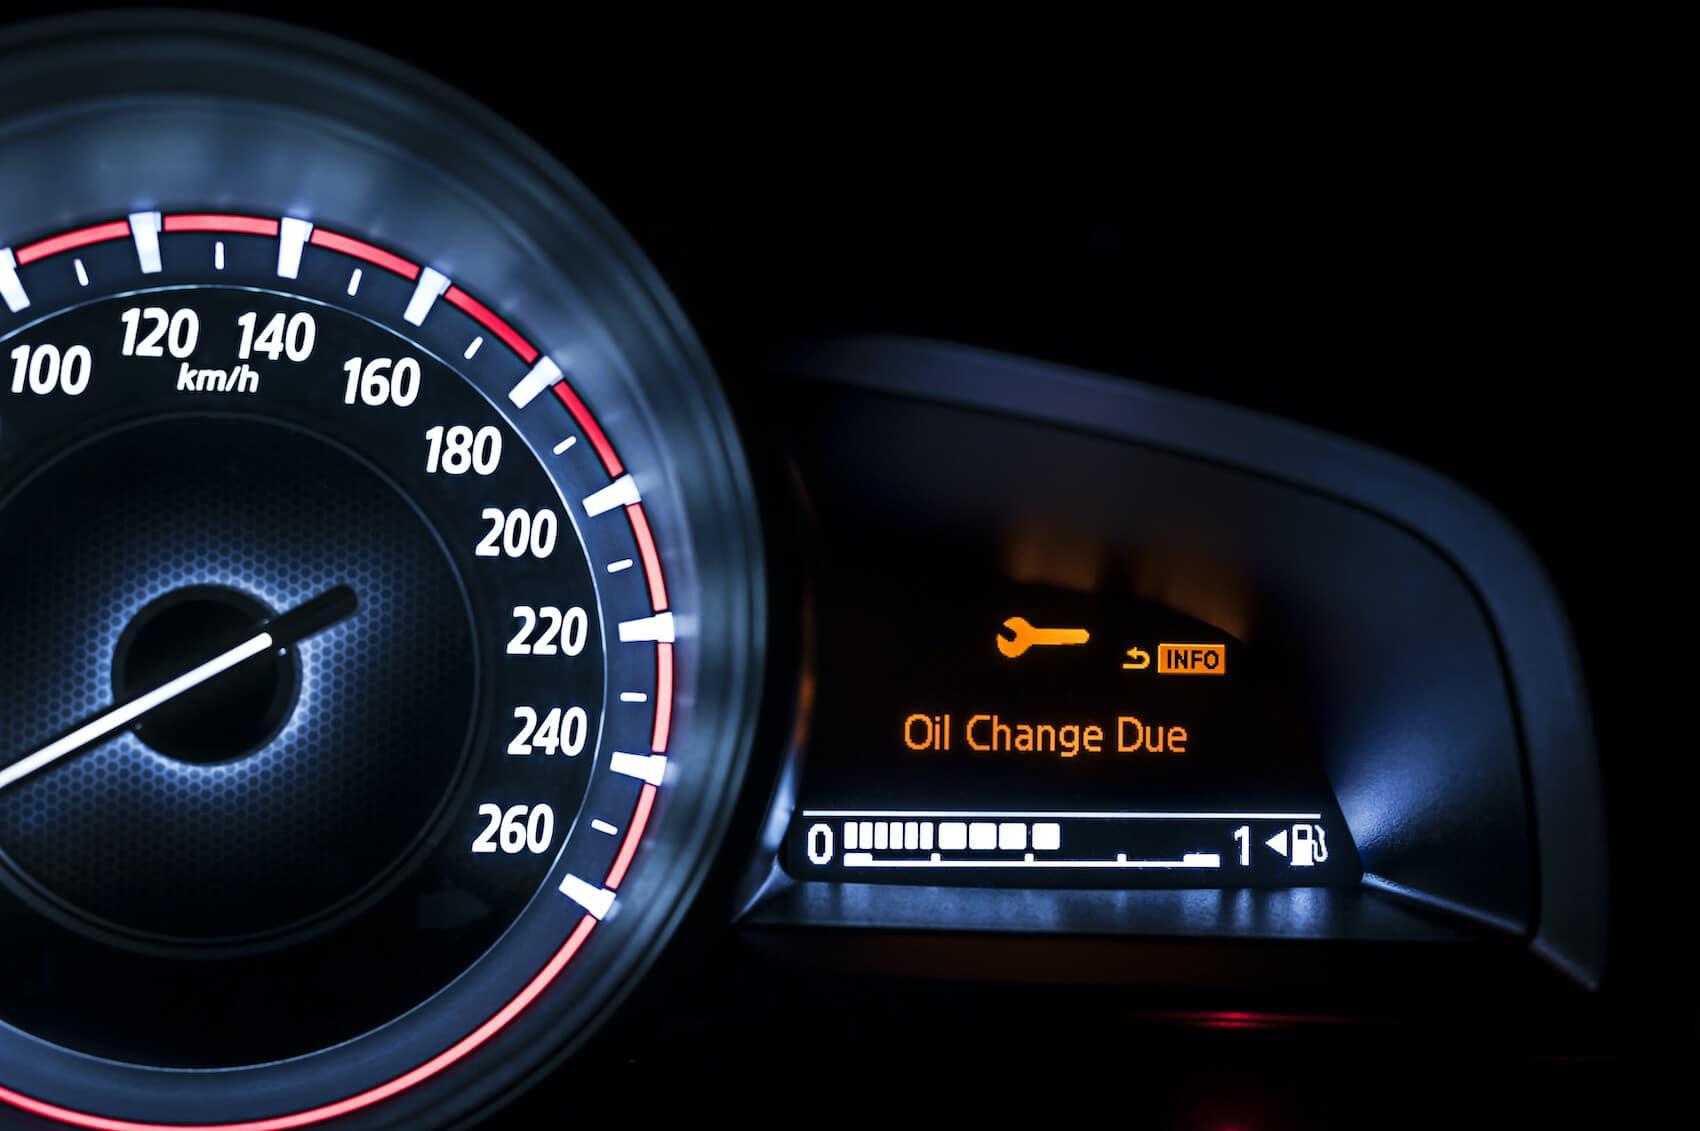 When to Schedule Oil Change